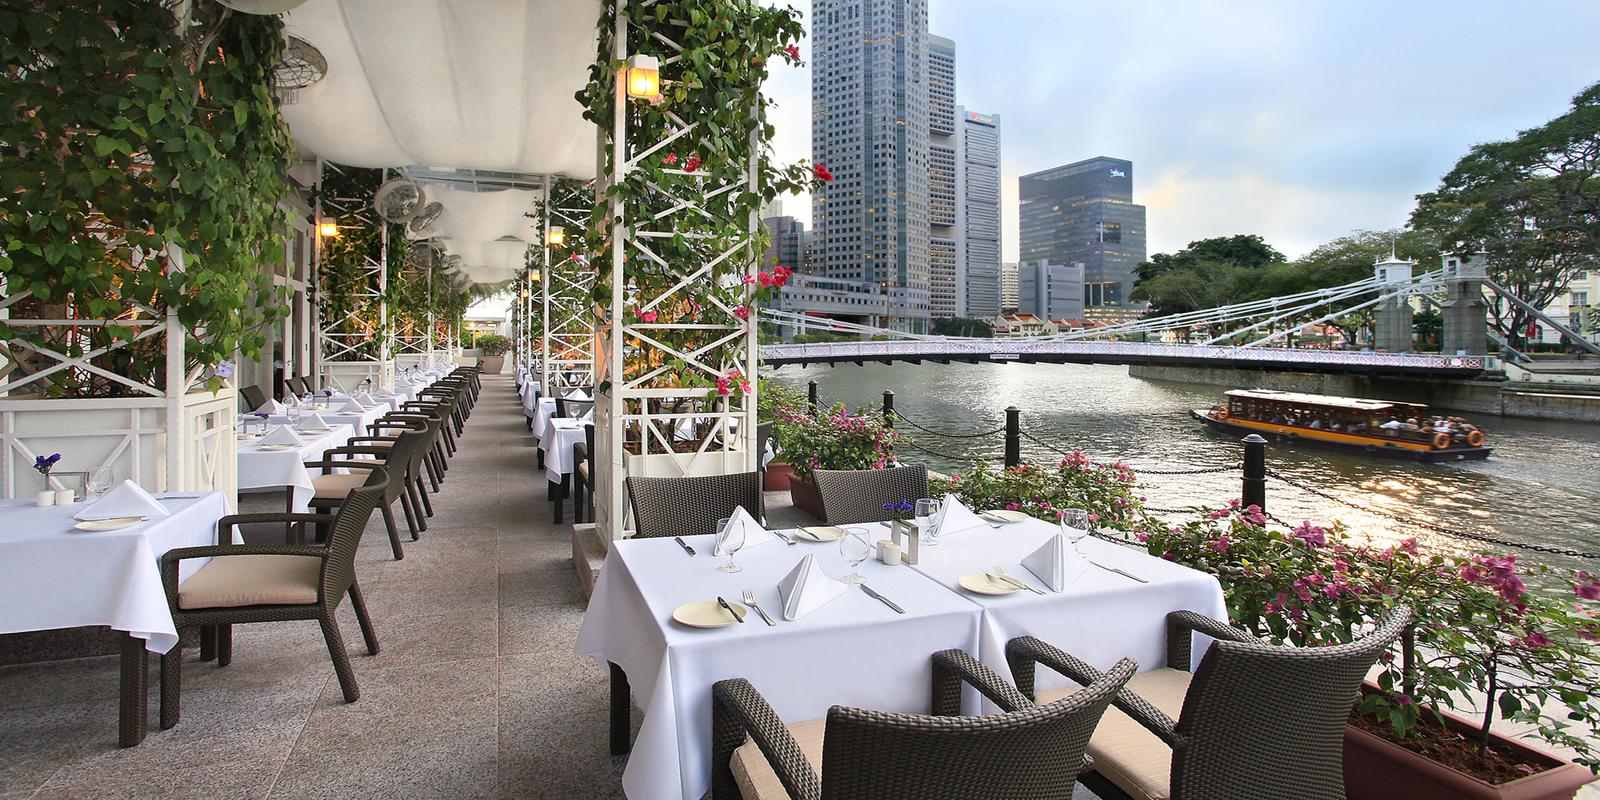 Town Restaurant Burpple 82 Reviews Raffles Place Singapore